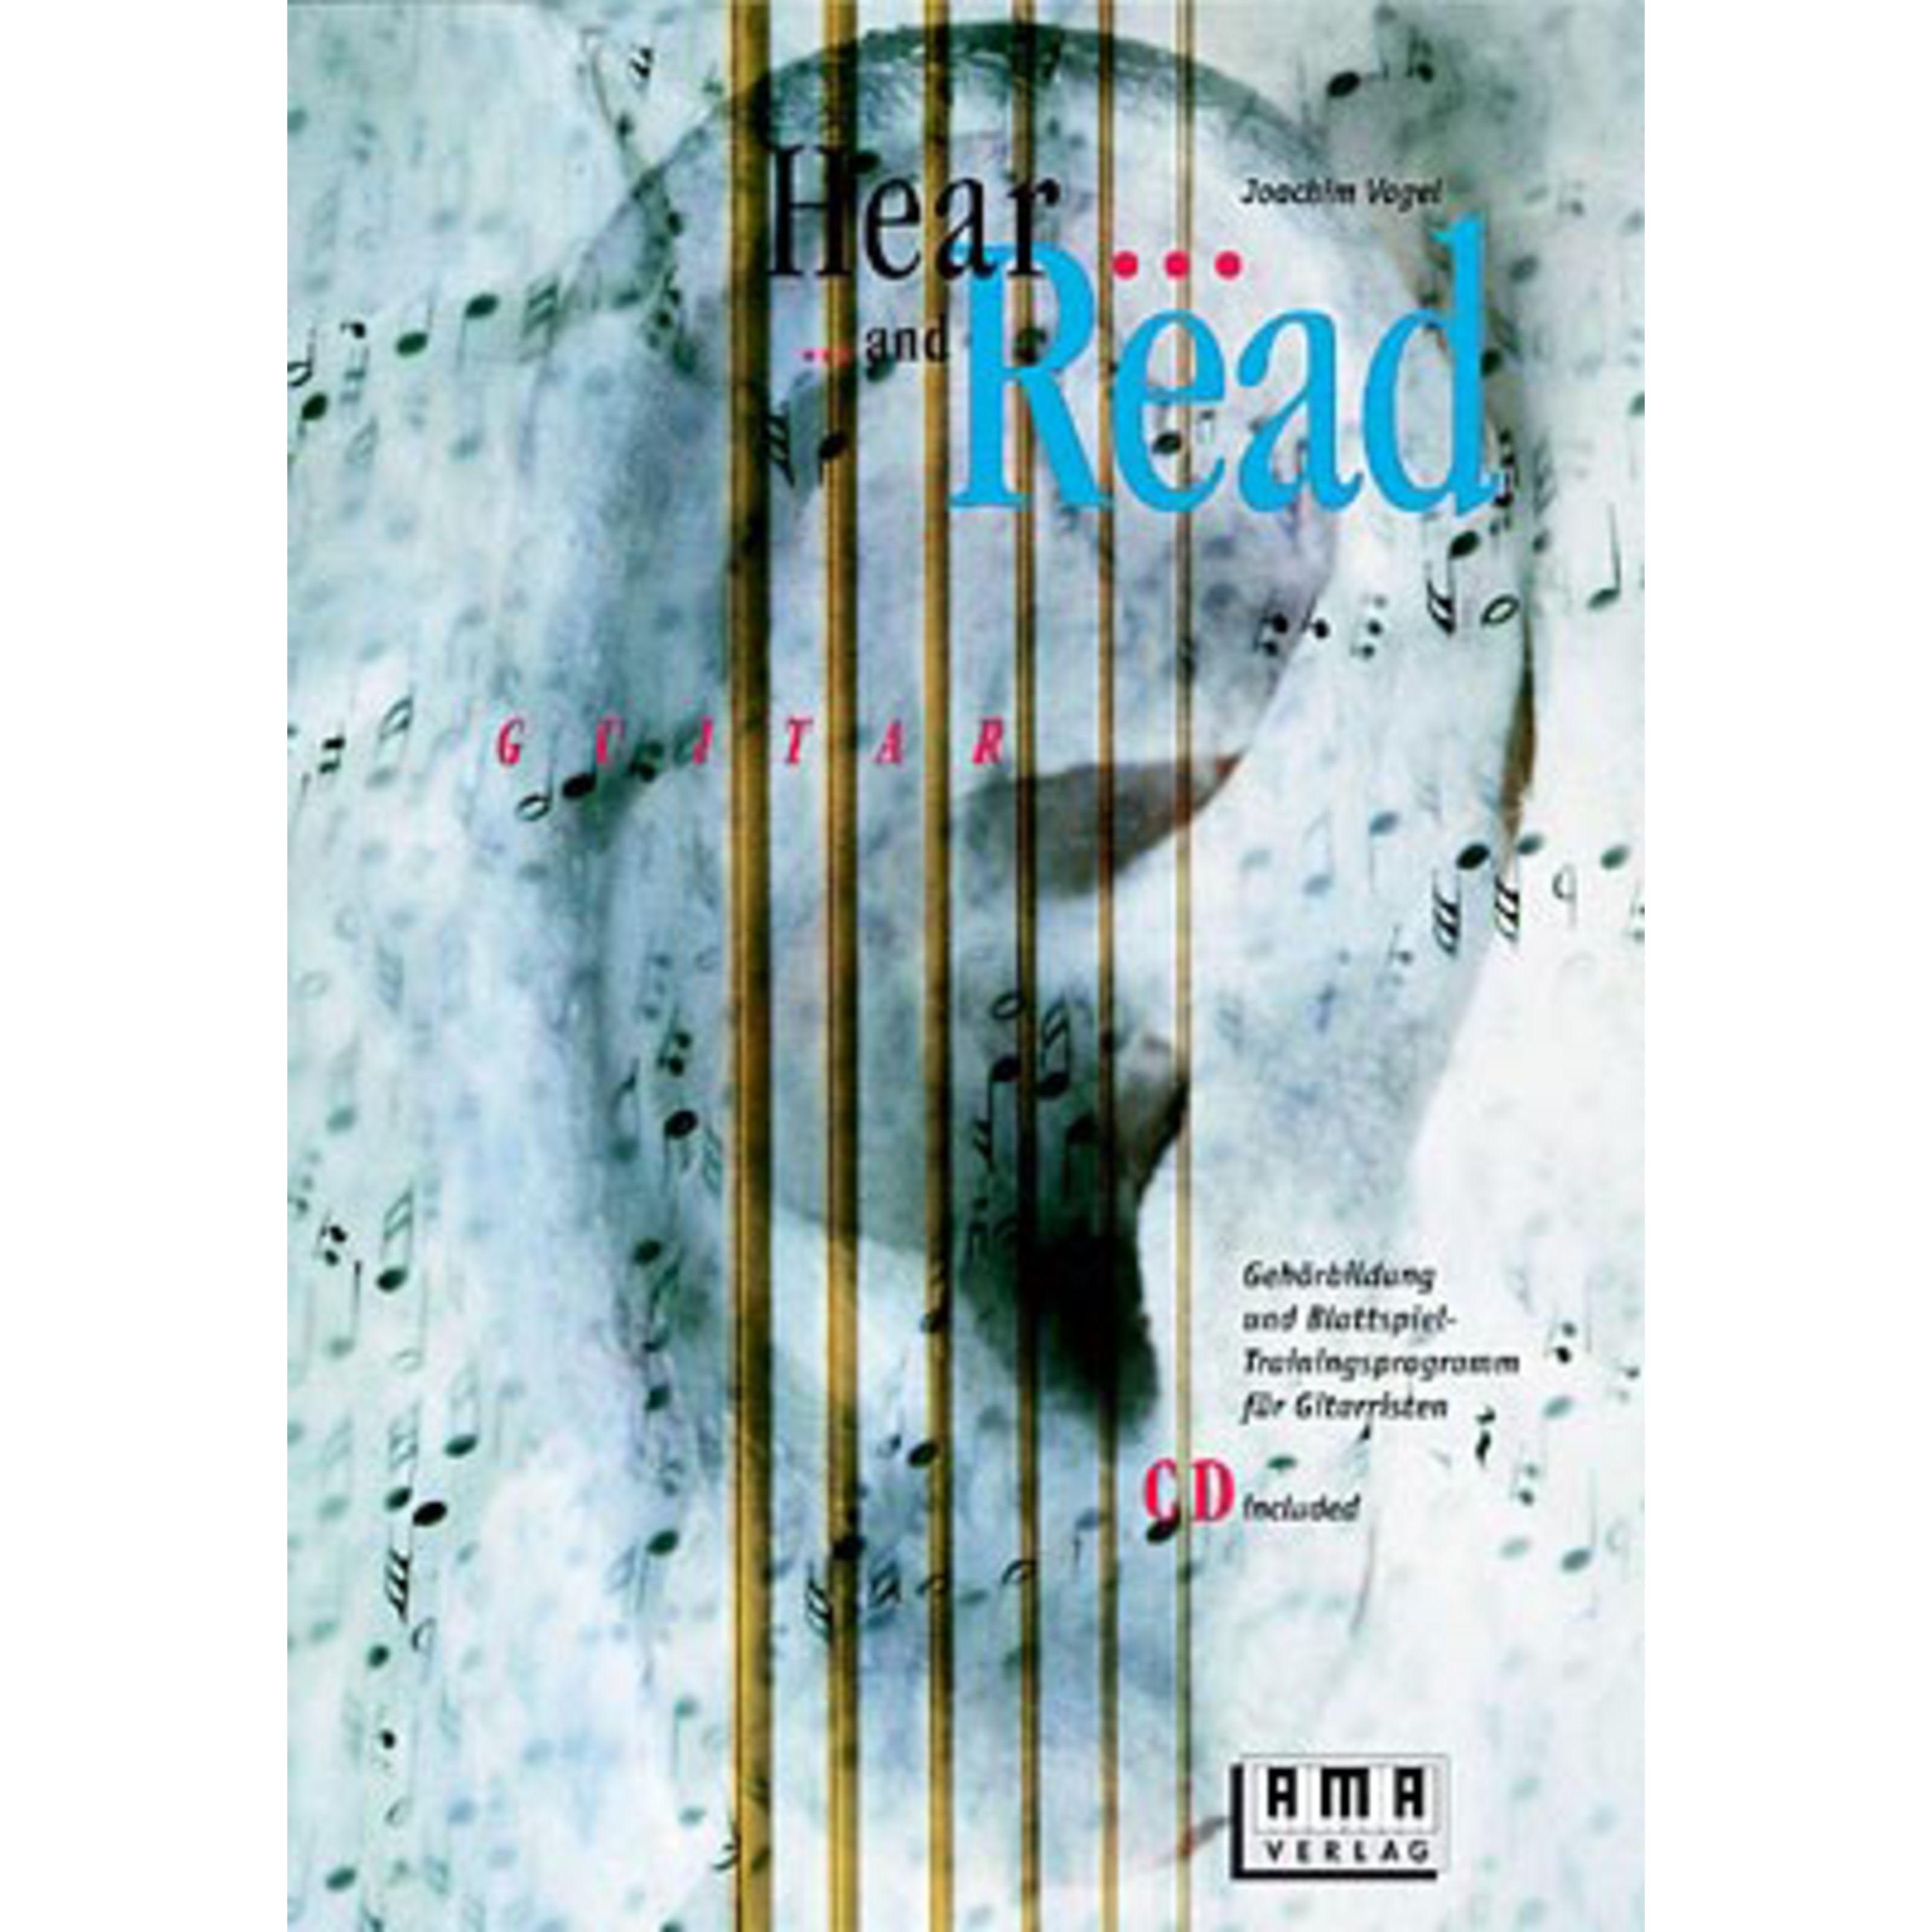 AMA Verlag - Hear and Read Guitar Joachim Vogel,inkl. CD 610144